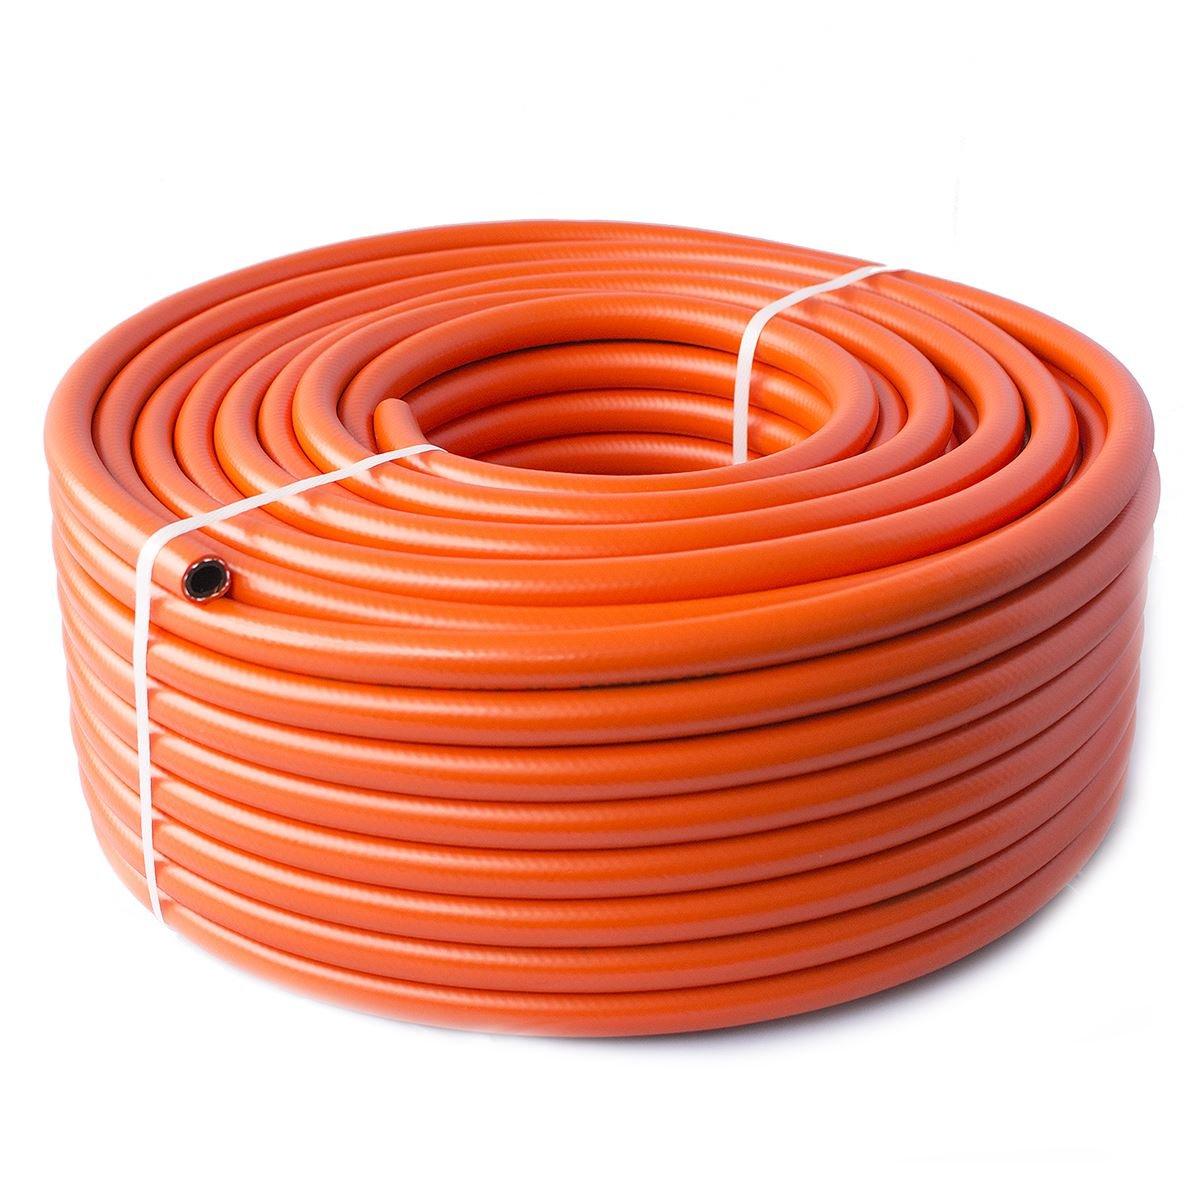 0.7m - Propane Butane LPG Gas hose pipe for Camping Caravan BBQ - High pressure - 8 mm Quantum Garden